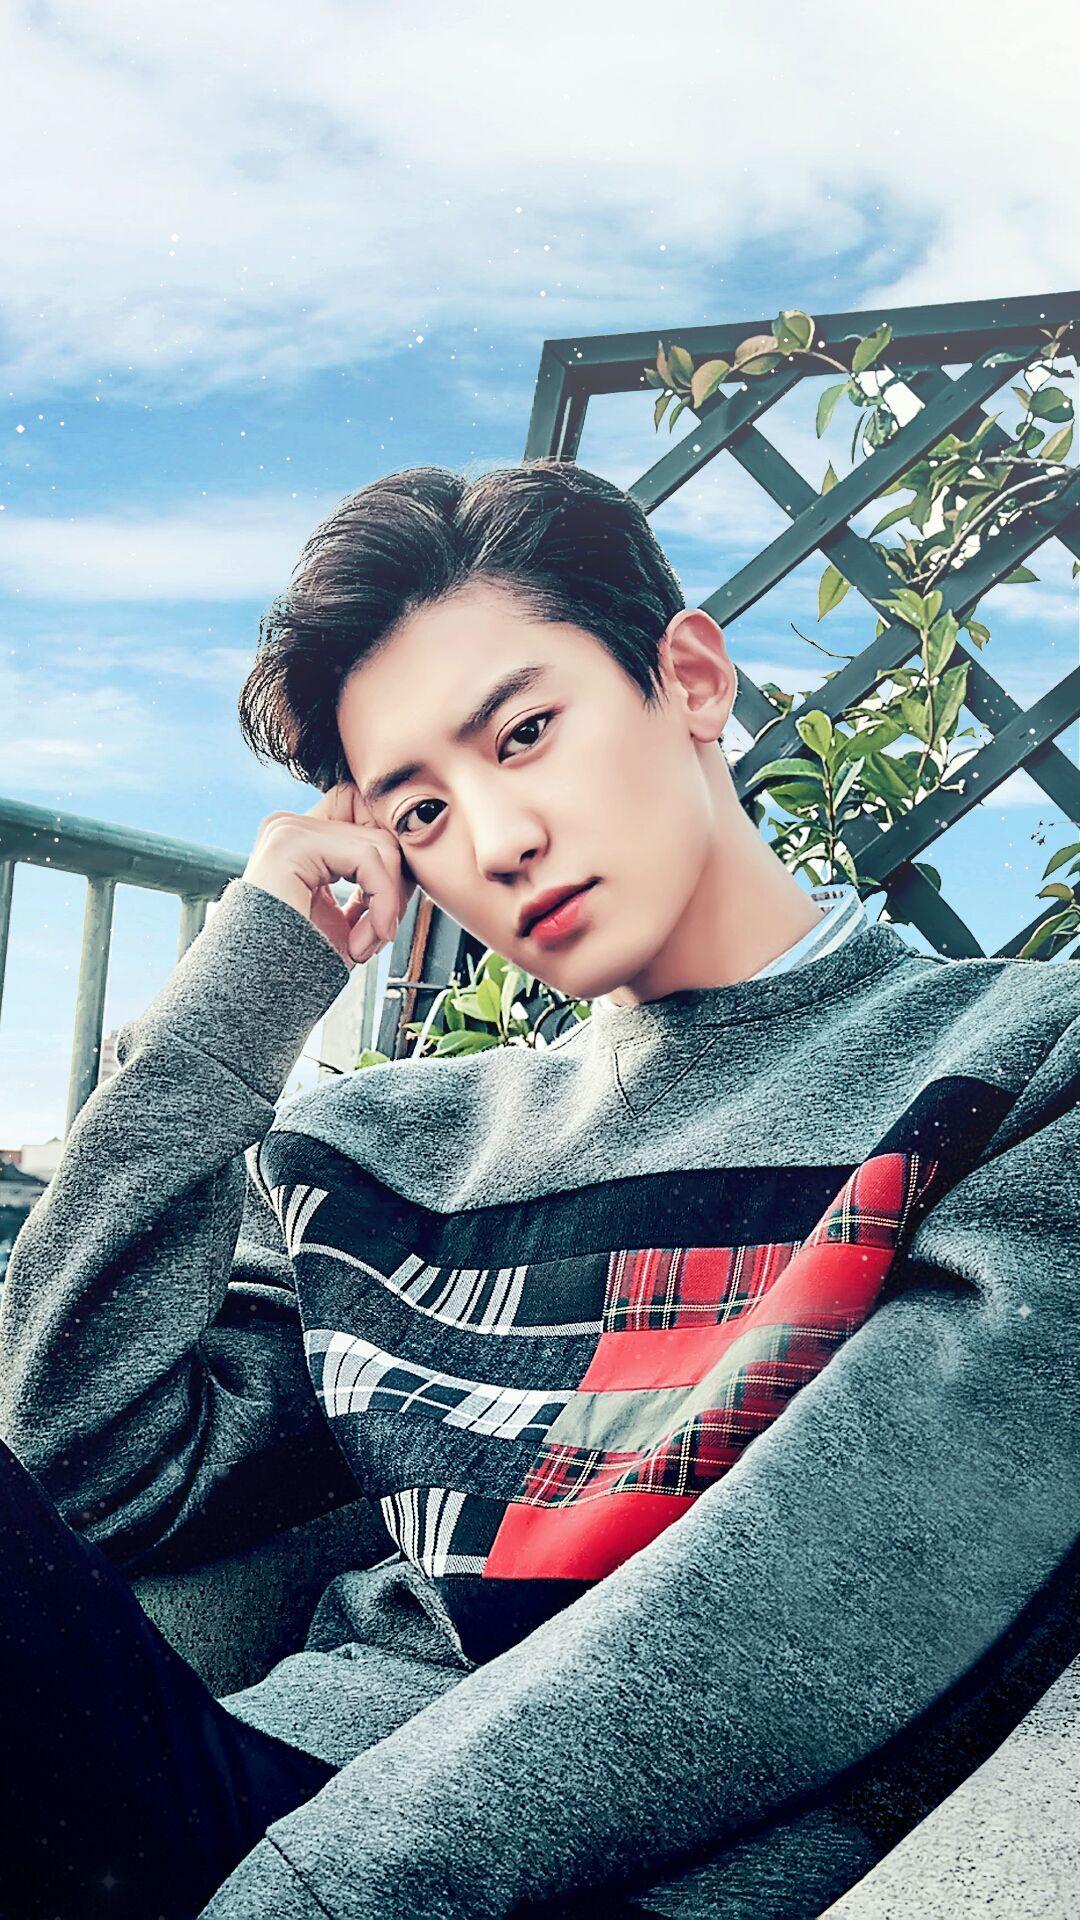 Kpop Wallpaper Park Chanyeol Chanyeol Exo